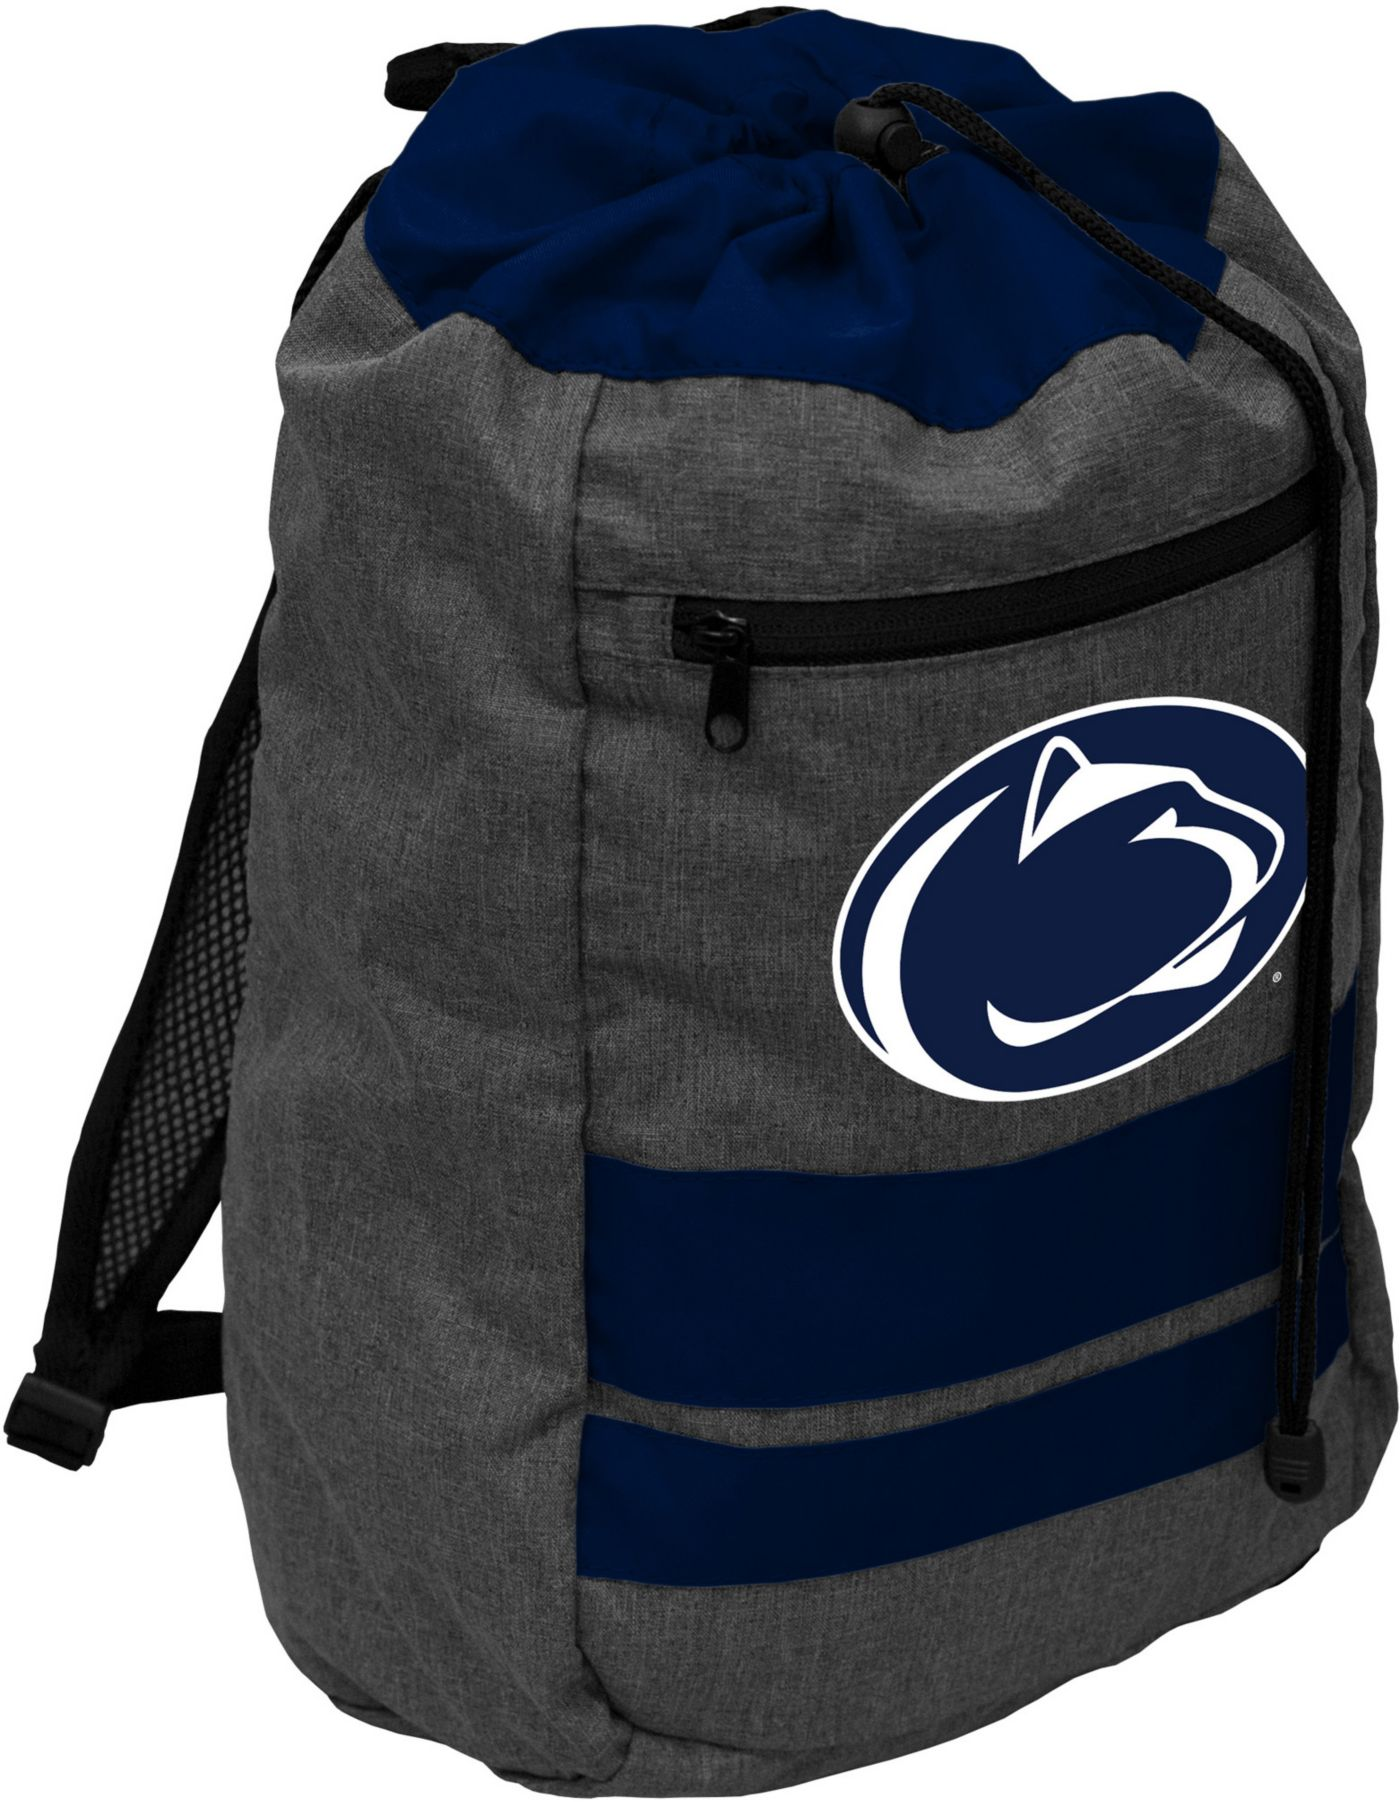 Penn State Nittany Lions Journey Backsack